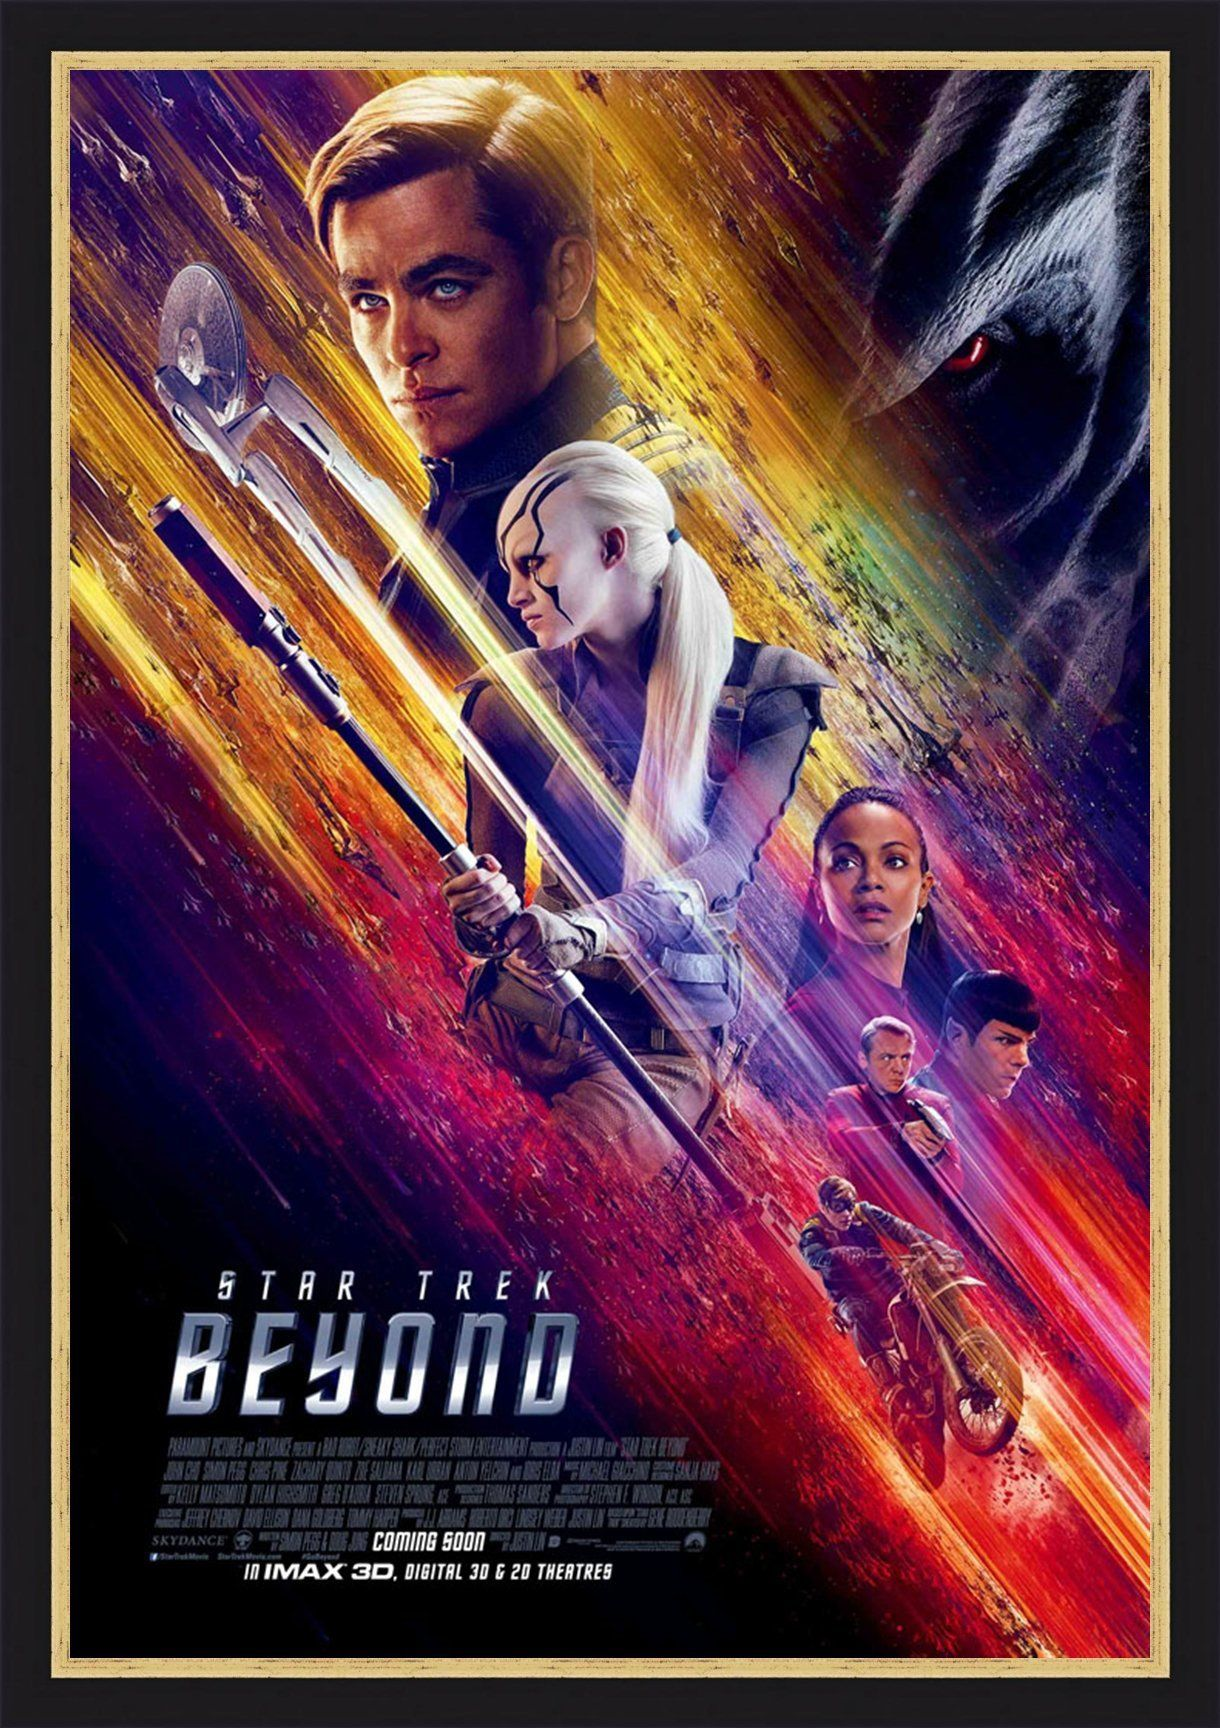 Star Trek Beyond - 2016